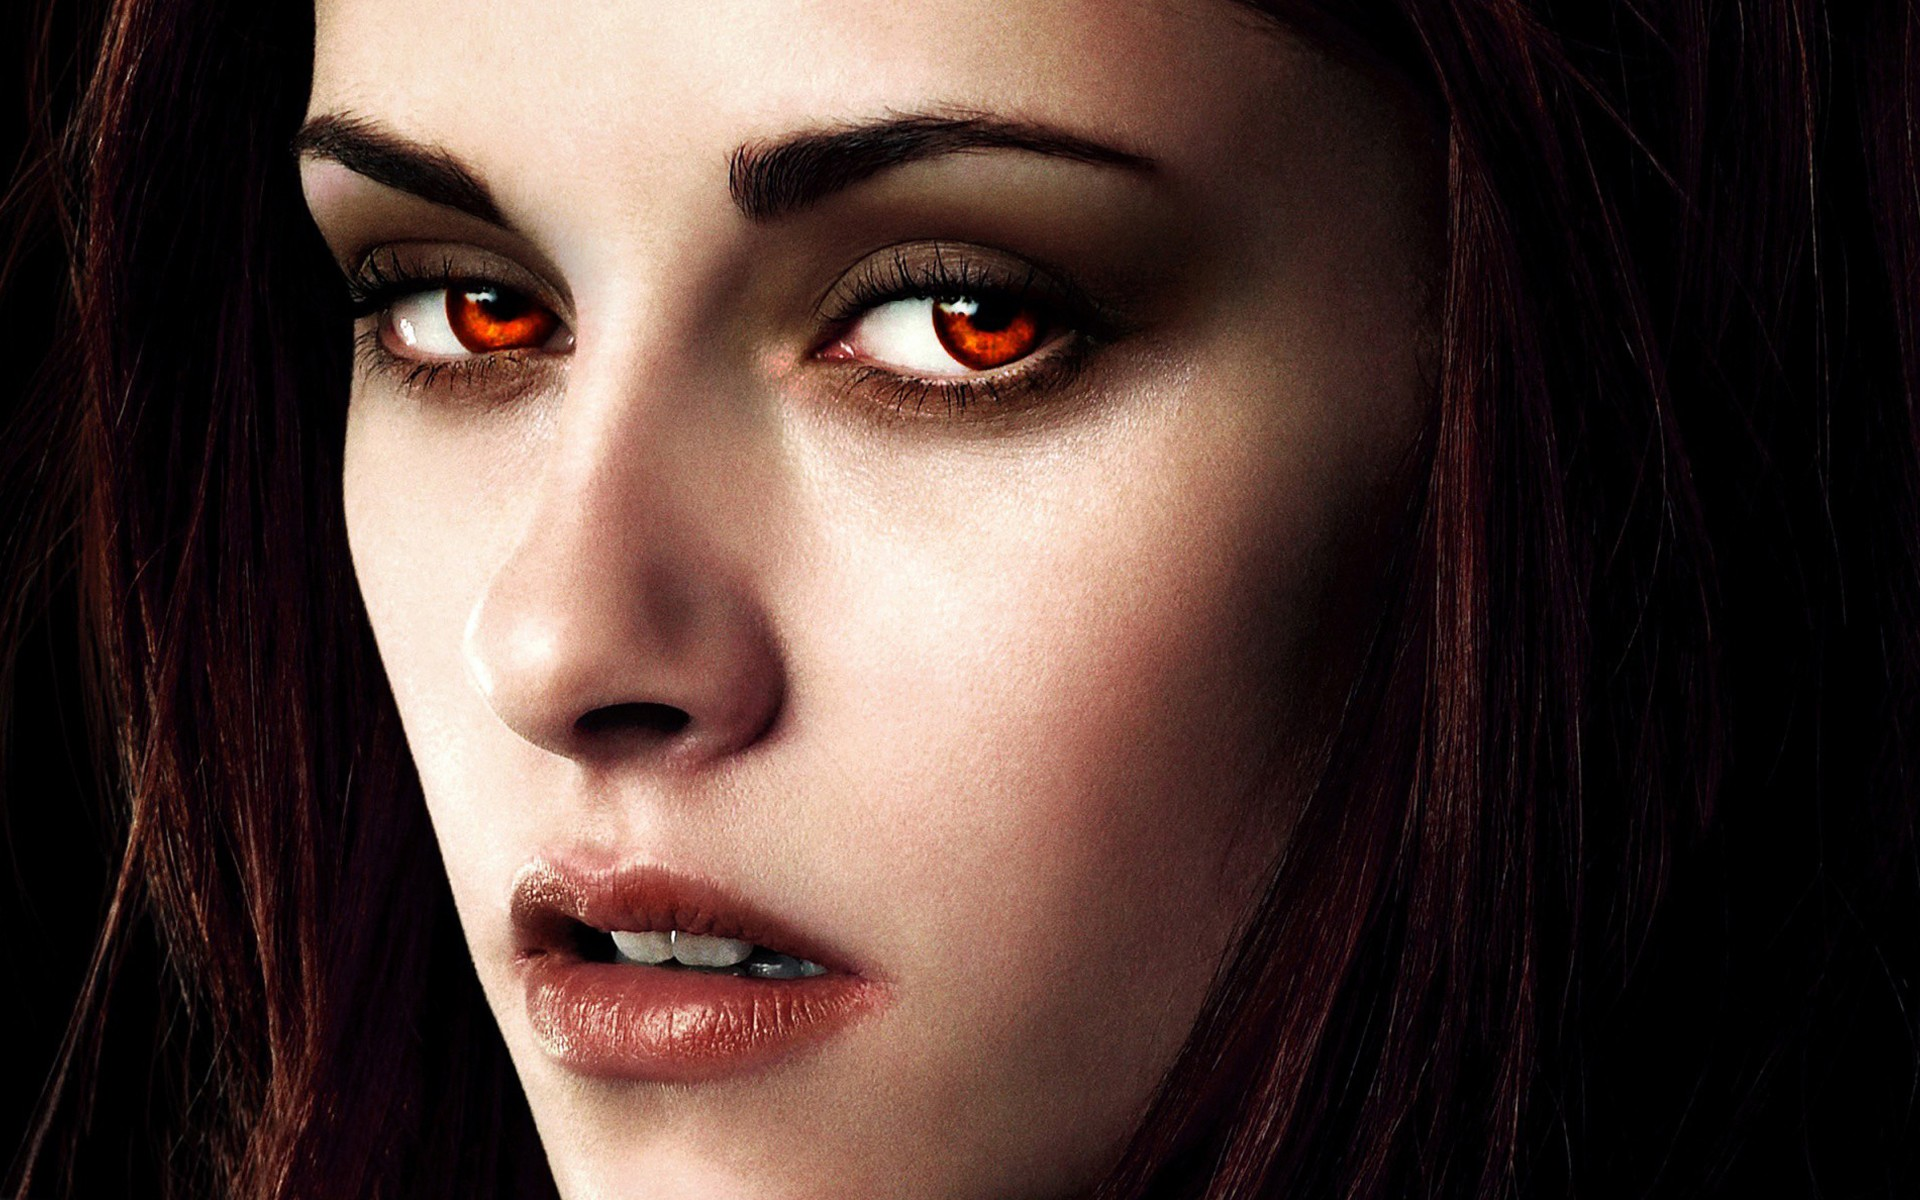 kristen-stewart-twilight-red-eyes-faces-breaking-dawn-celebrity-celebr-1920x1200-wallpaper581